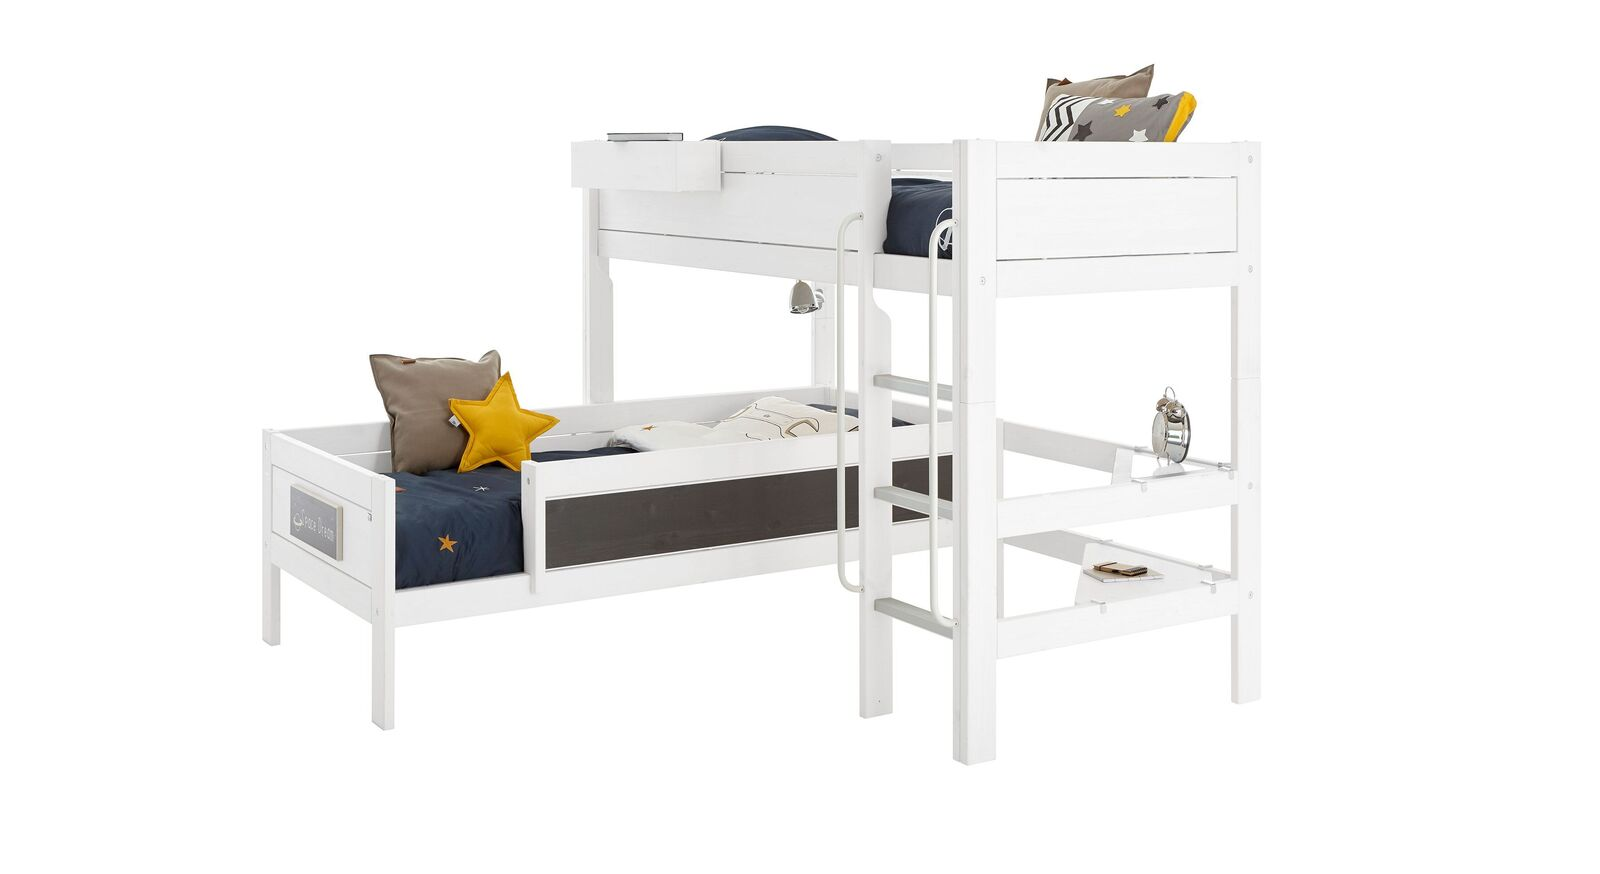 LIFETIME Eckt-Etagenbett Original aus weiß lackiertem Holz